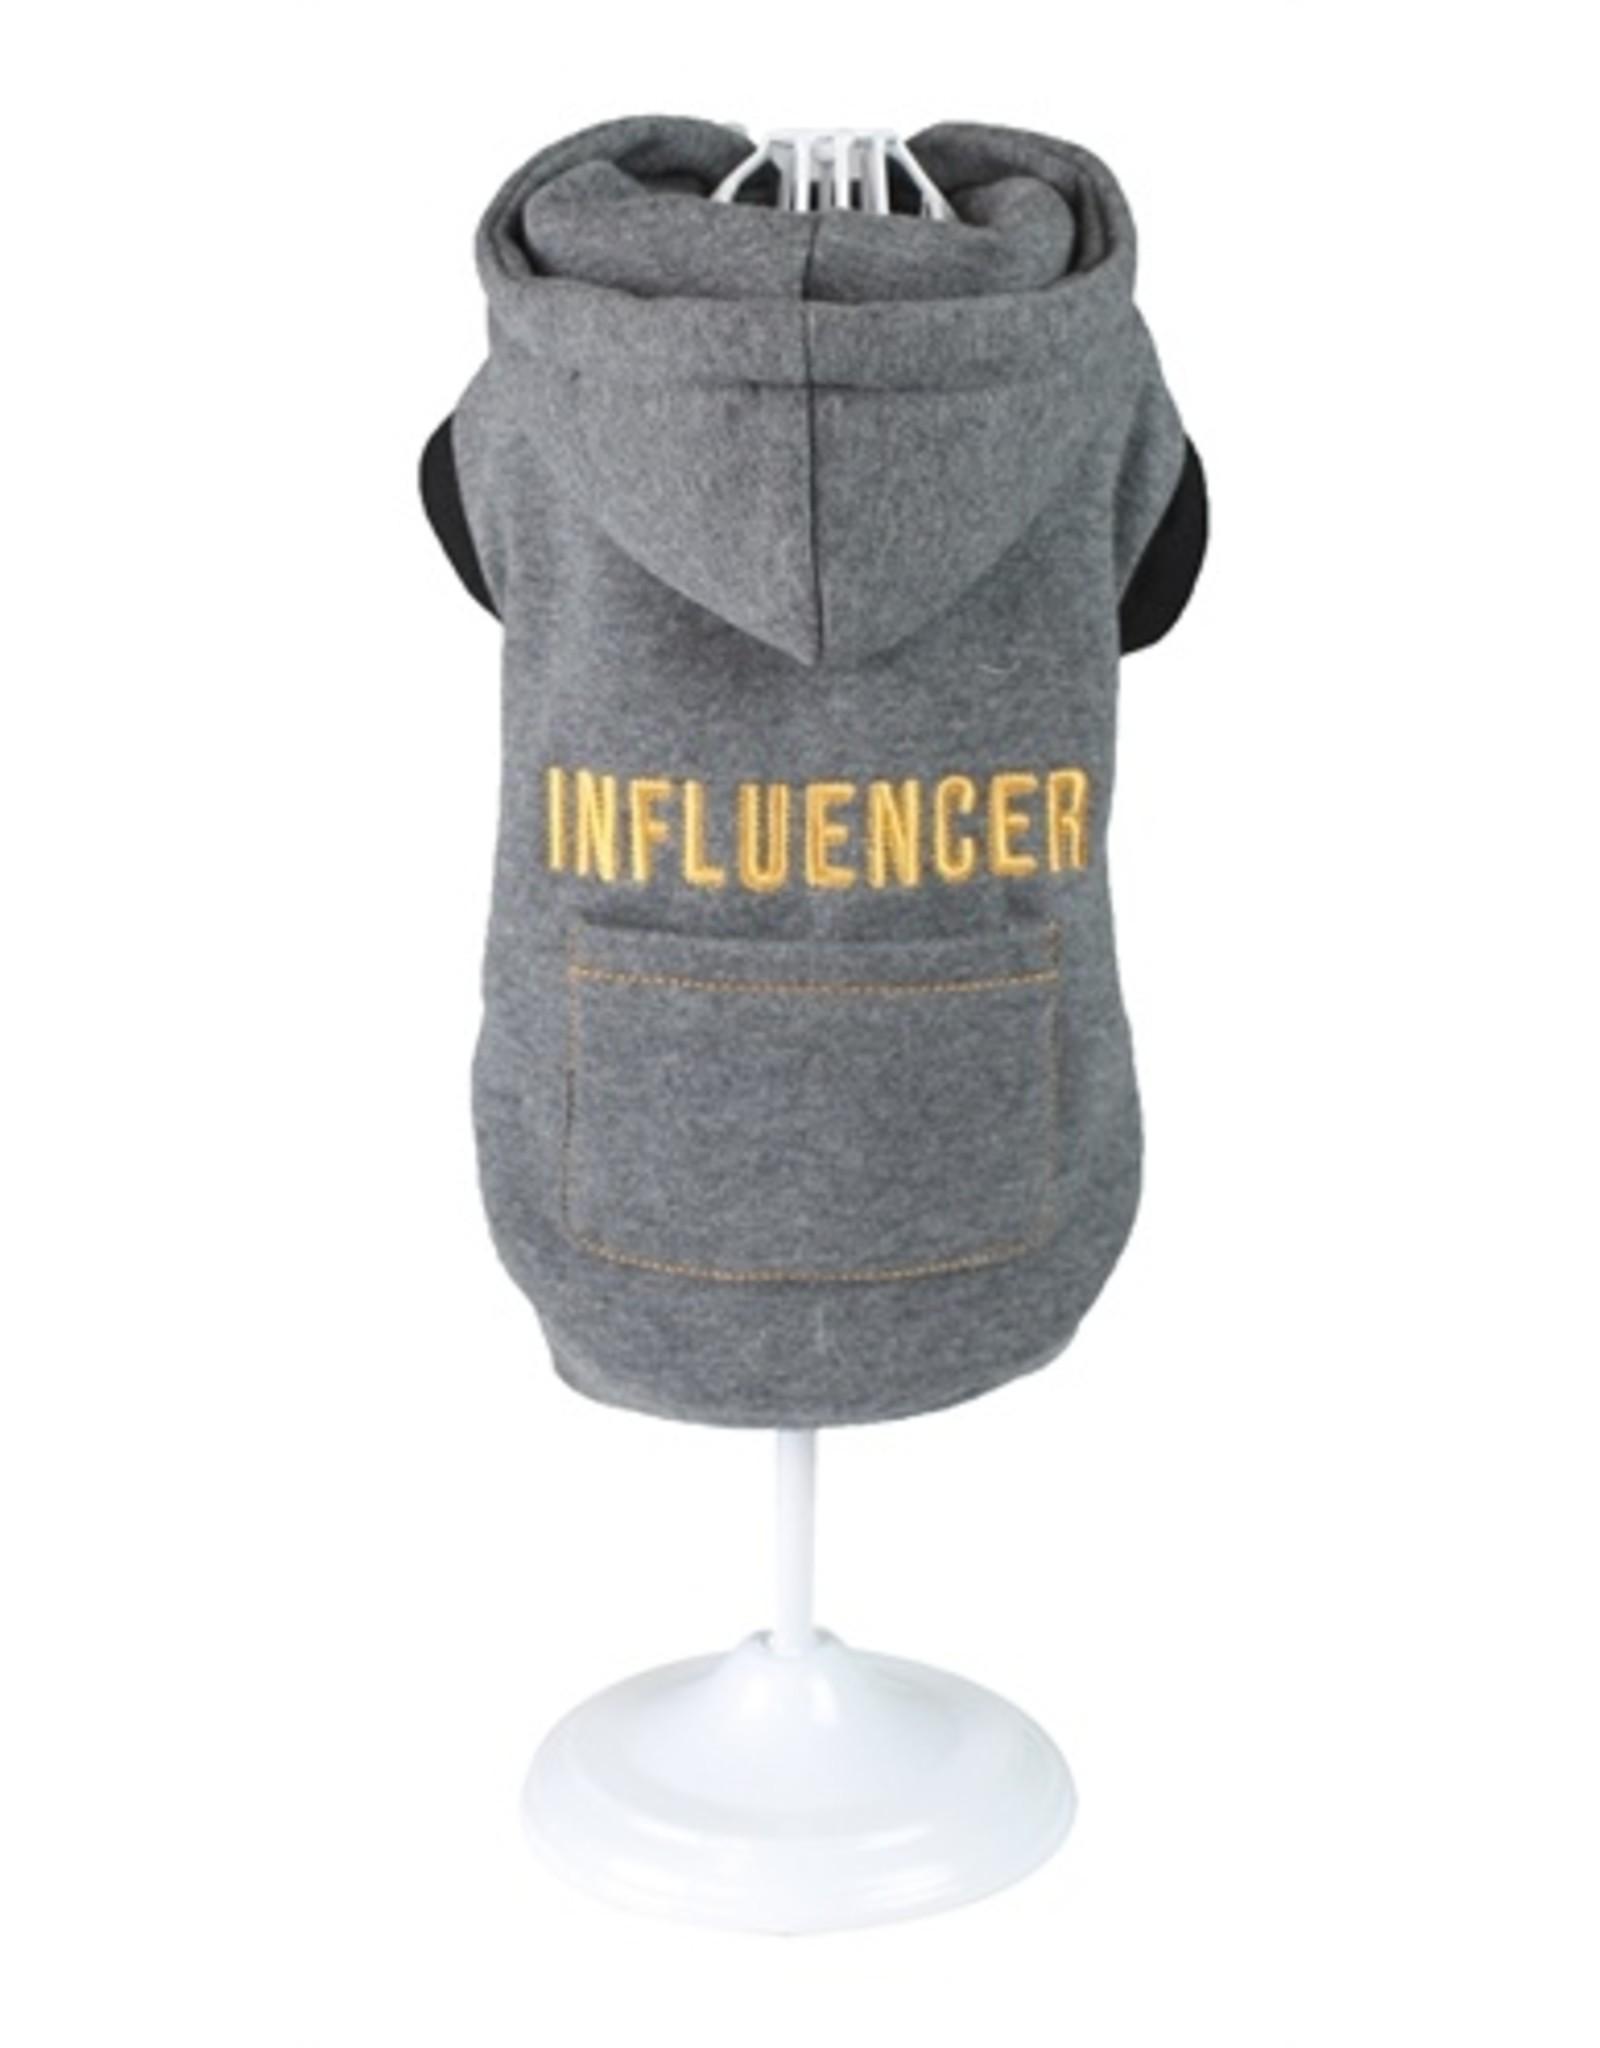 Croci Croci hondentrui sweater influencer grijs